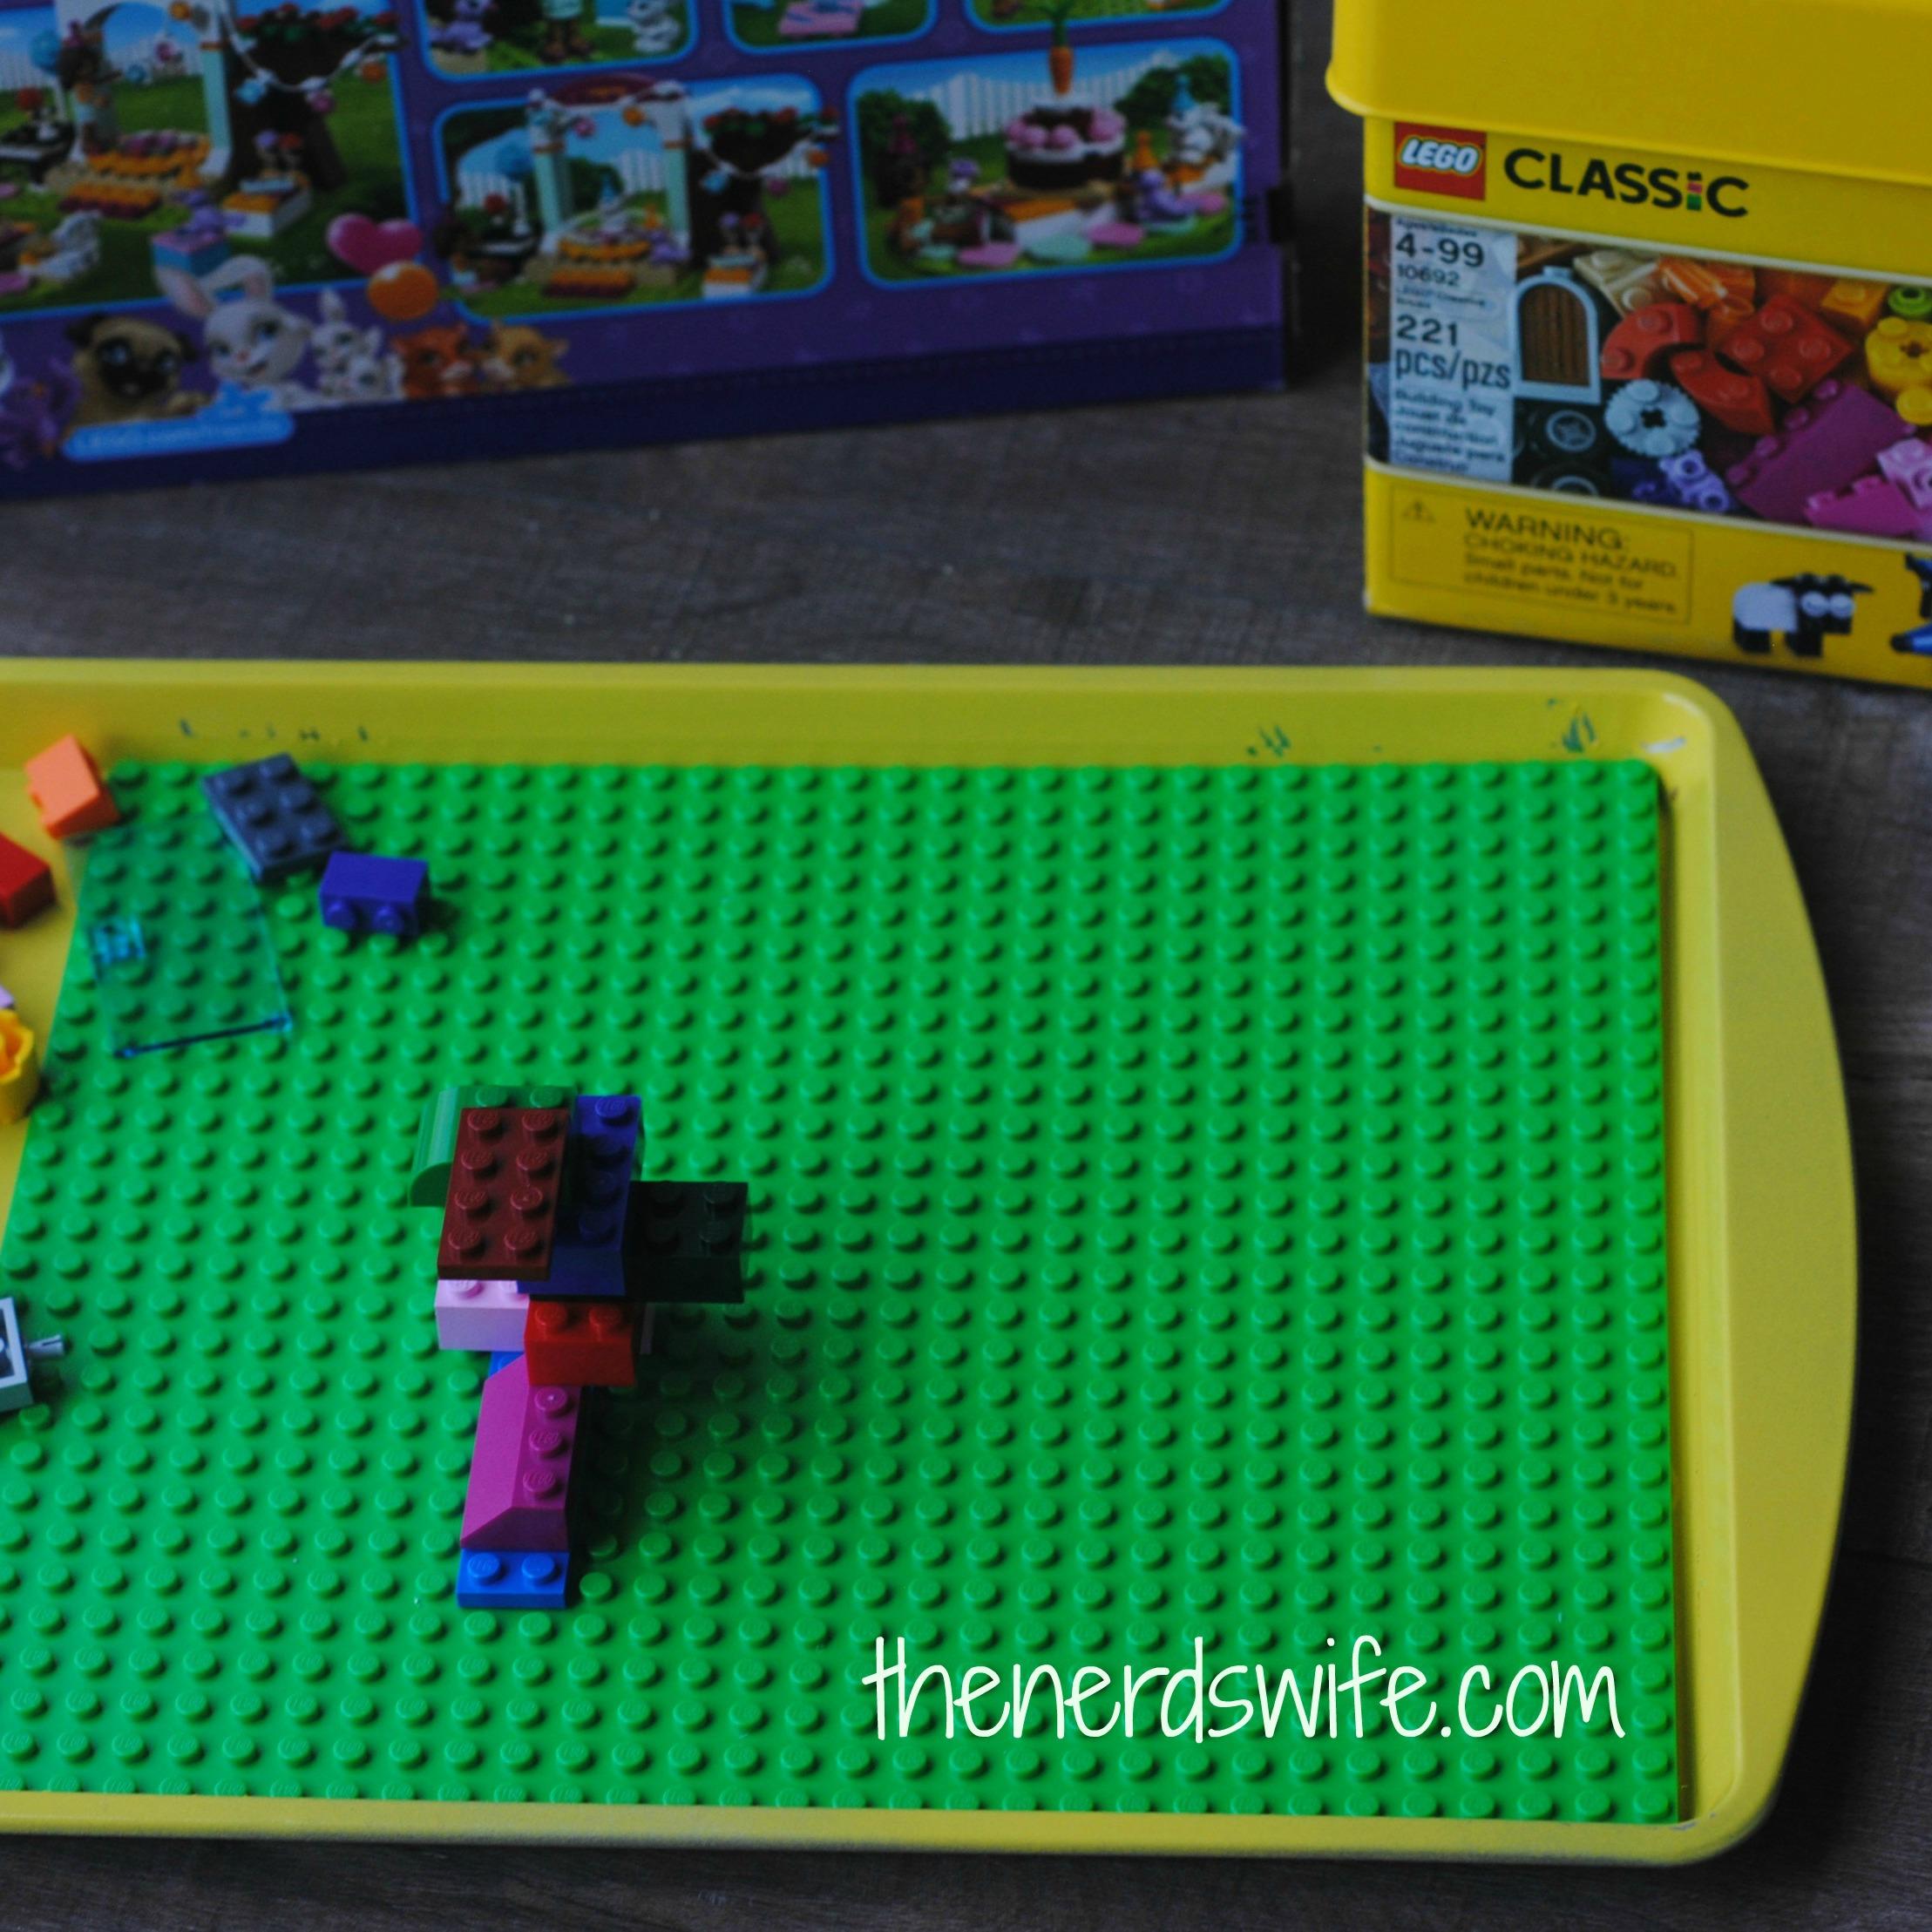 Diy Lego Travel Board With Netflix Streamteam The Nerd